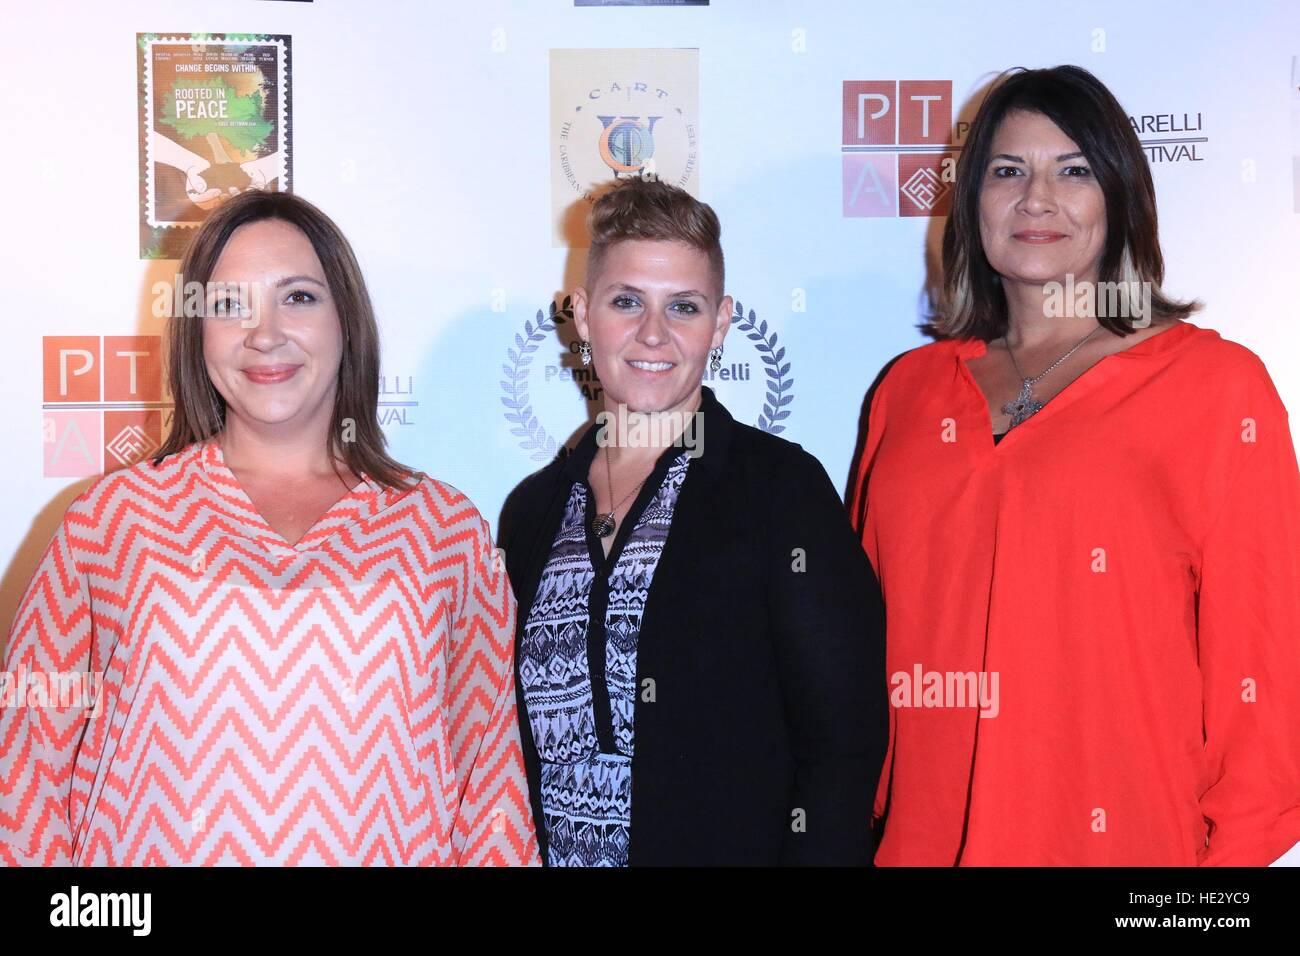 Tabrett Bethell,Annalee Jefferies Erotic video Jeannie Russell,Usha Kiran